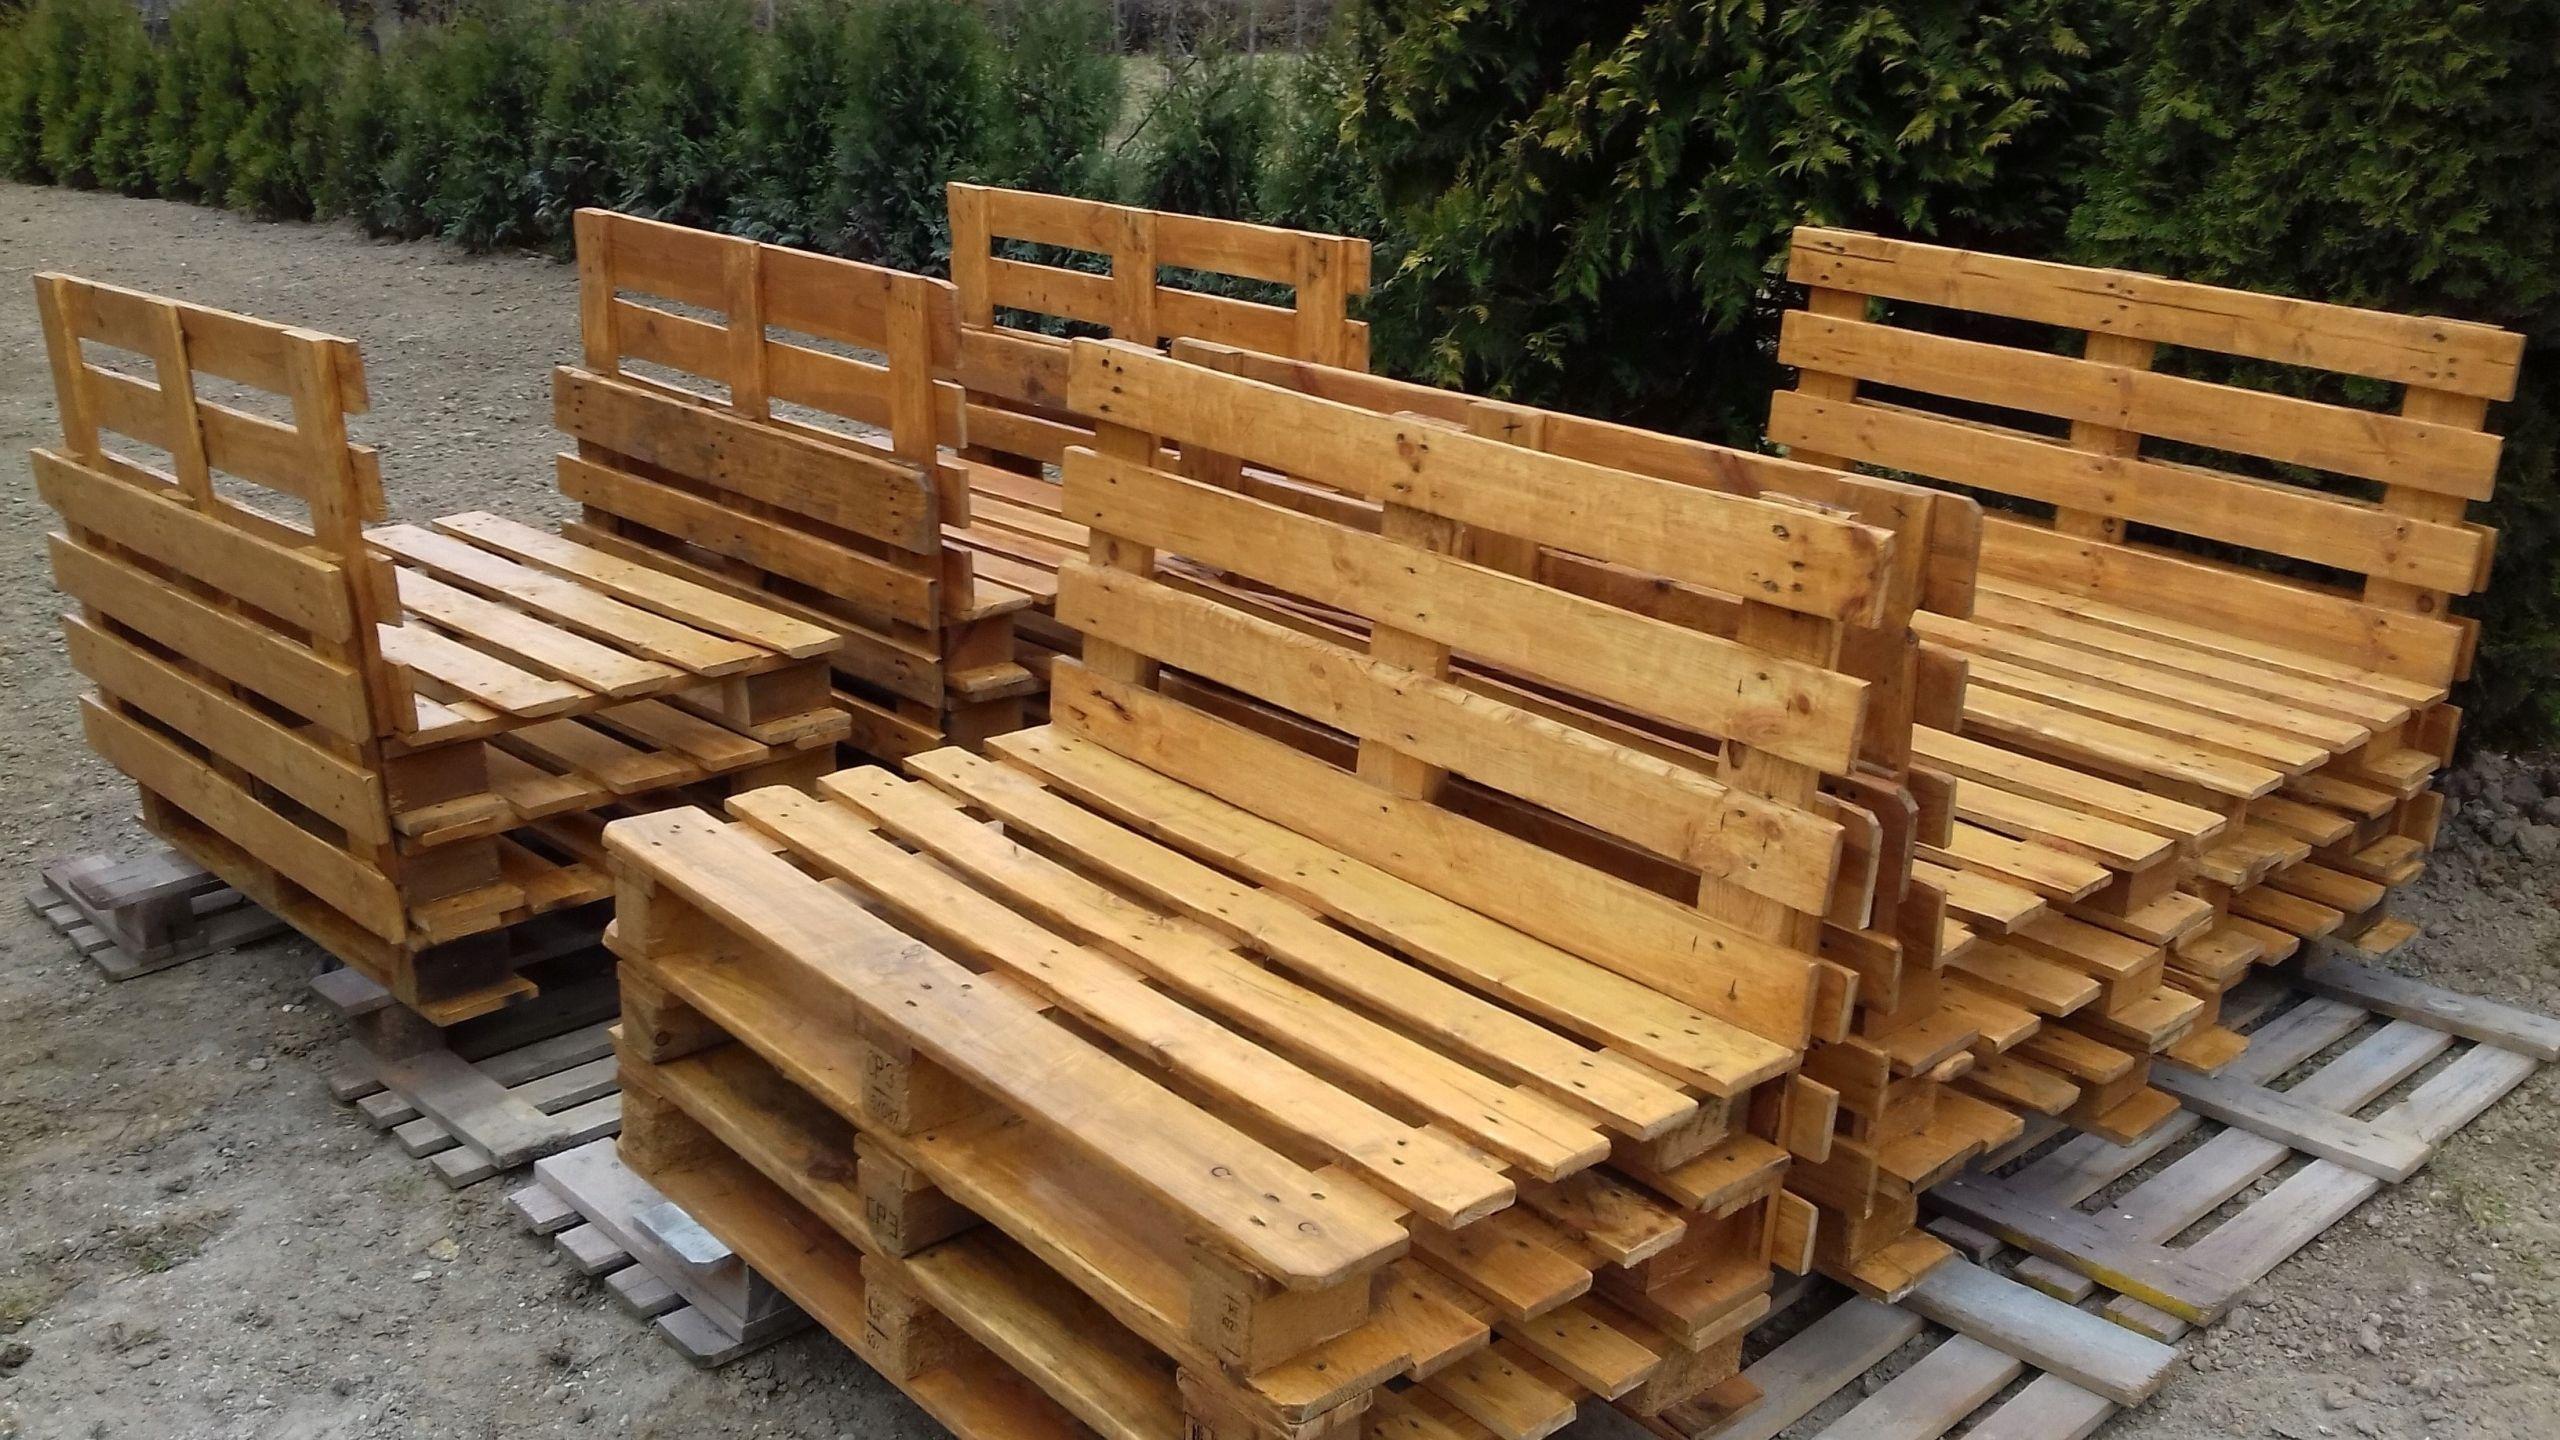 Meble Z Palet Lawka Tarasowa Ogrodowa Kolory Wood Texture